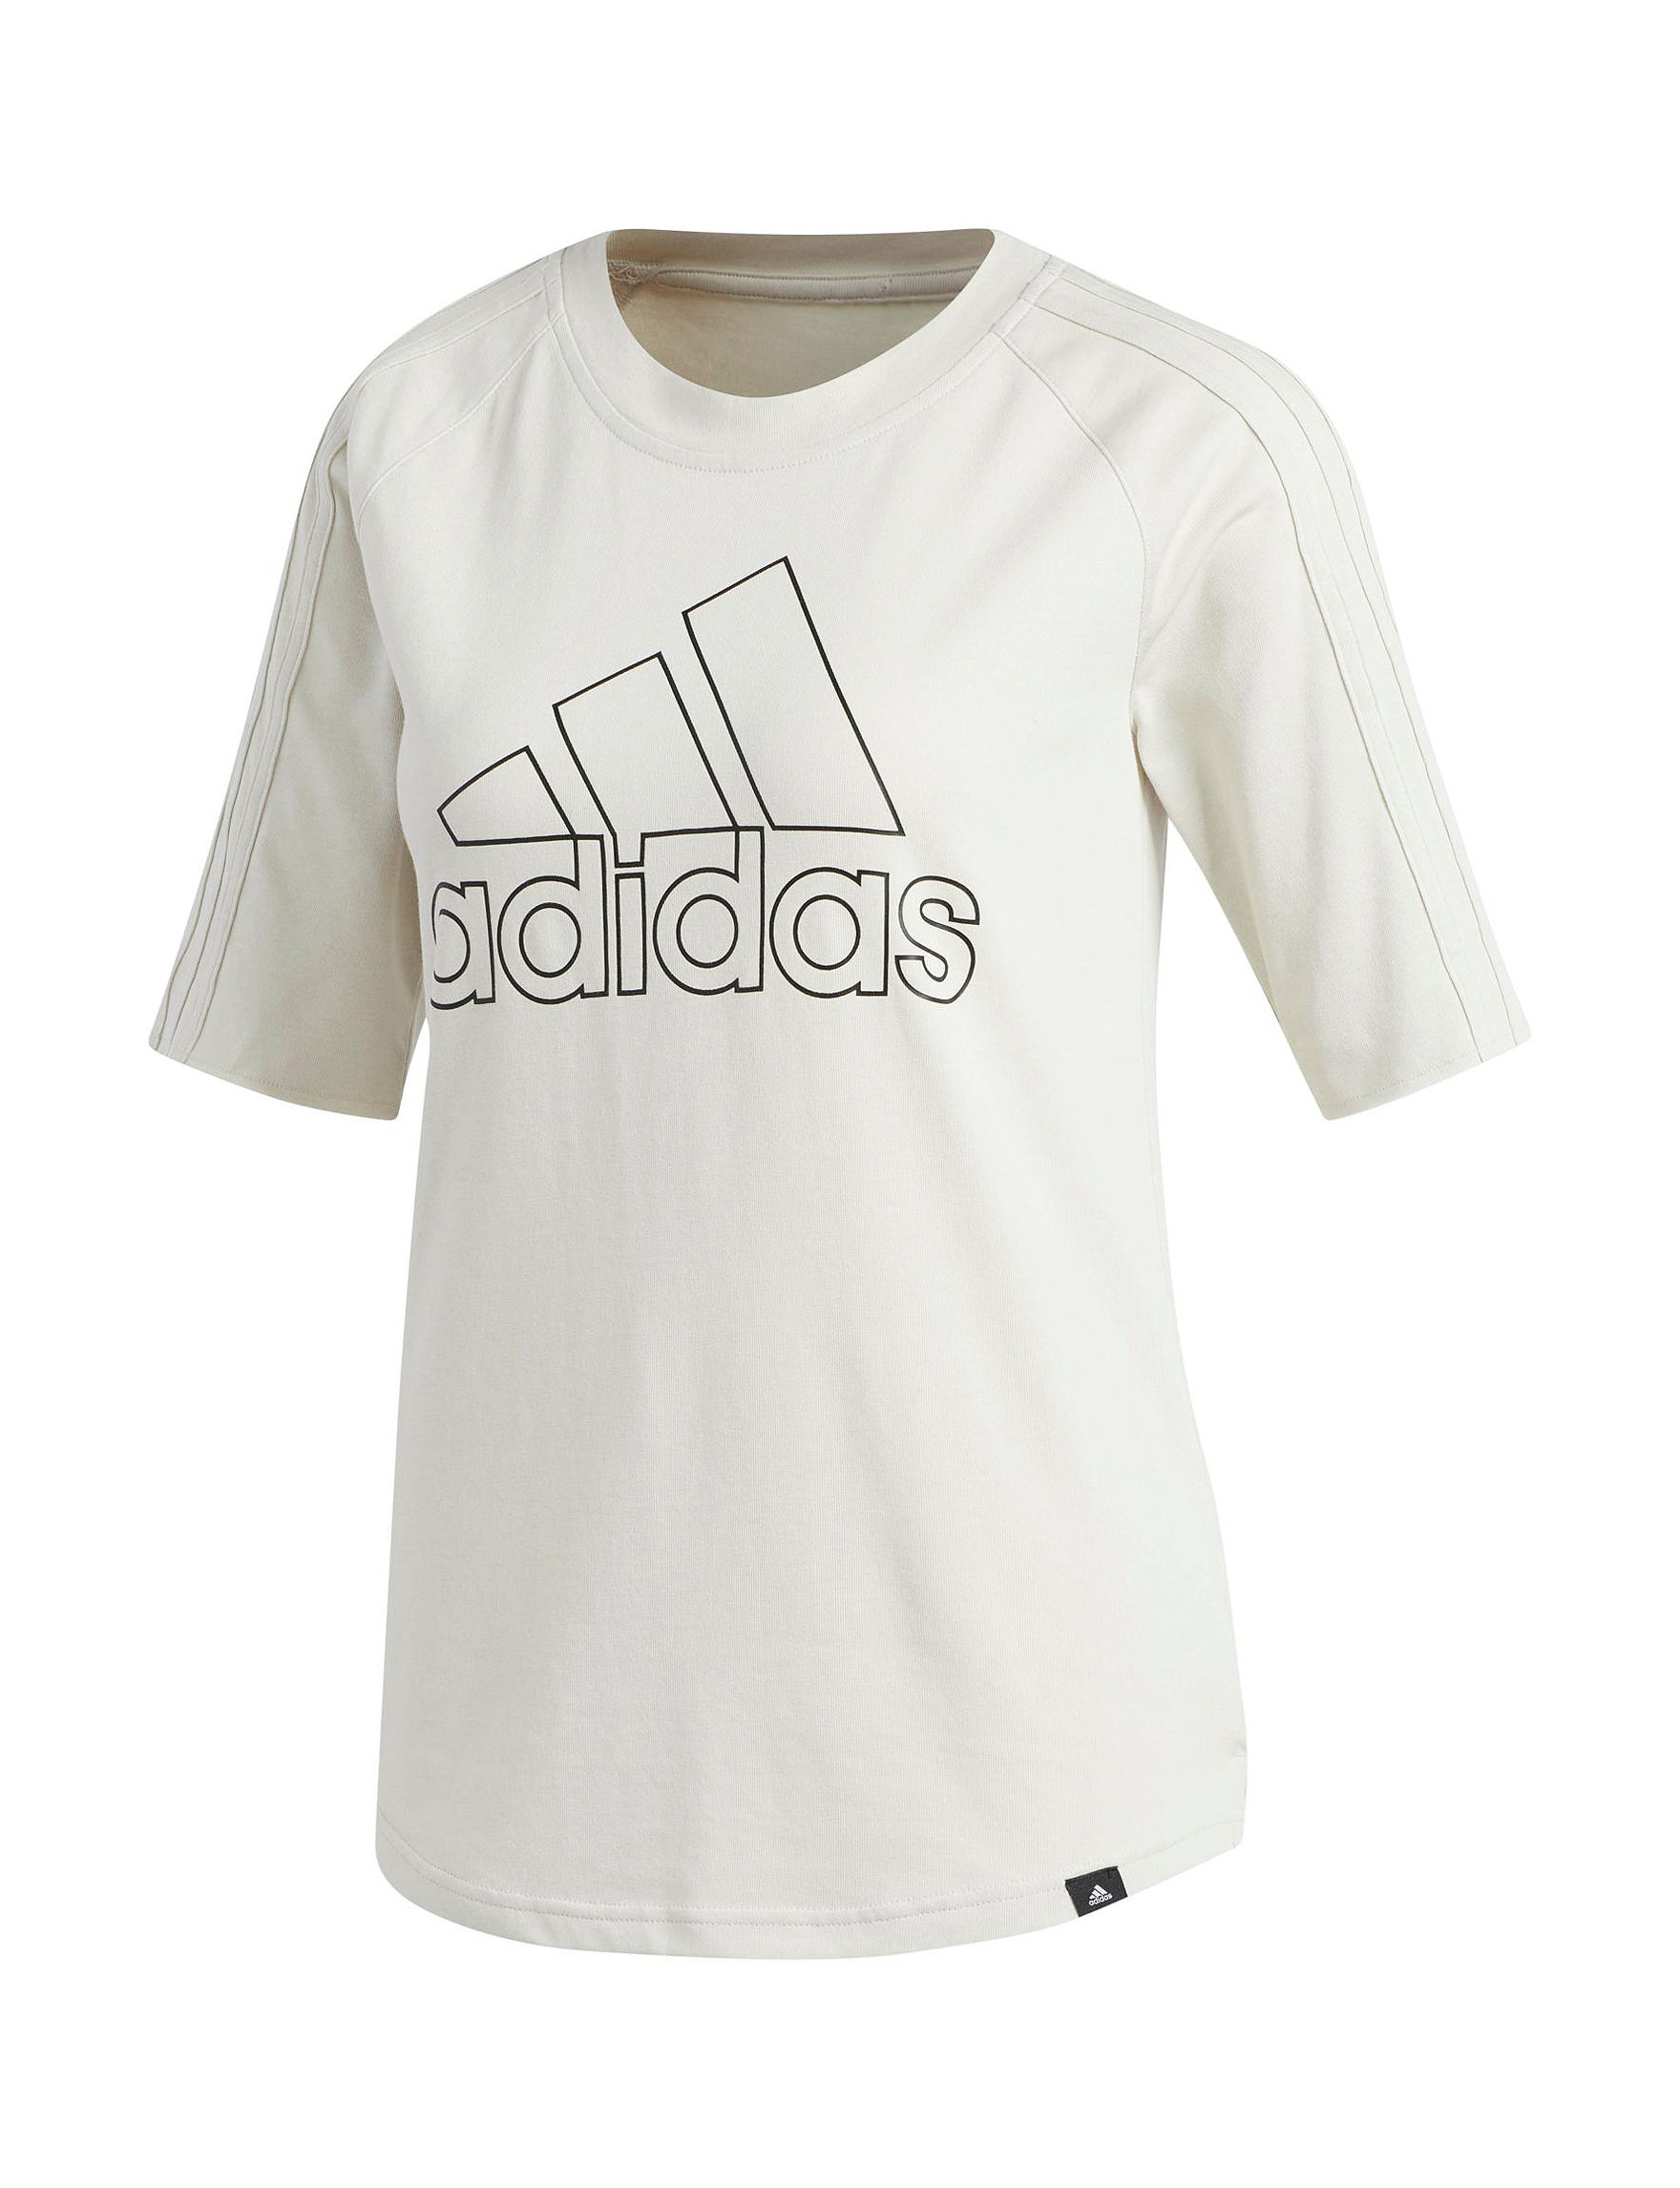 Adidas White / Black Tees & Tanks